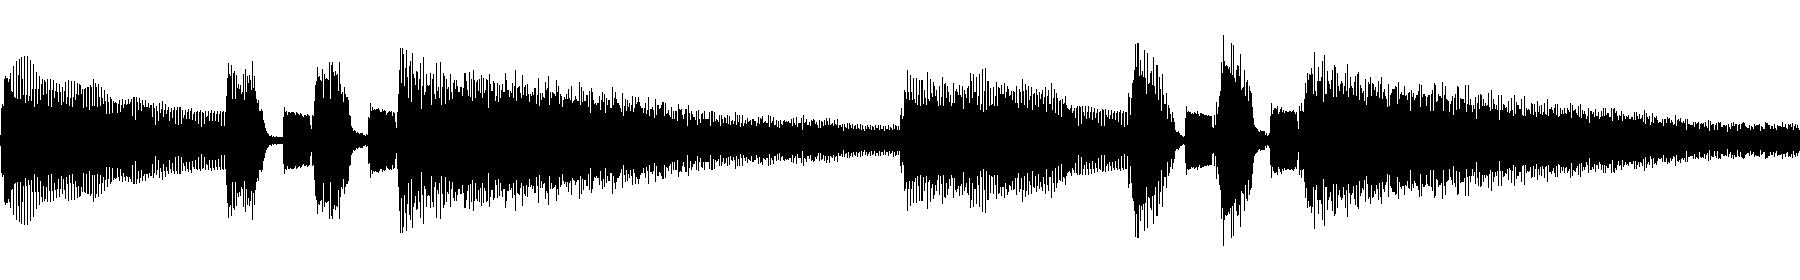 cymatics   lofi melody loop 2   75 bpm g maj